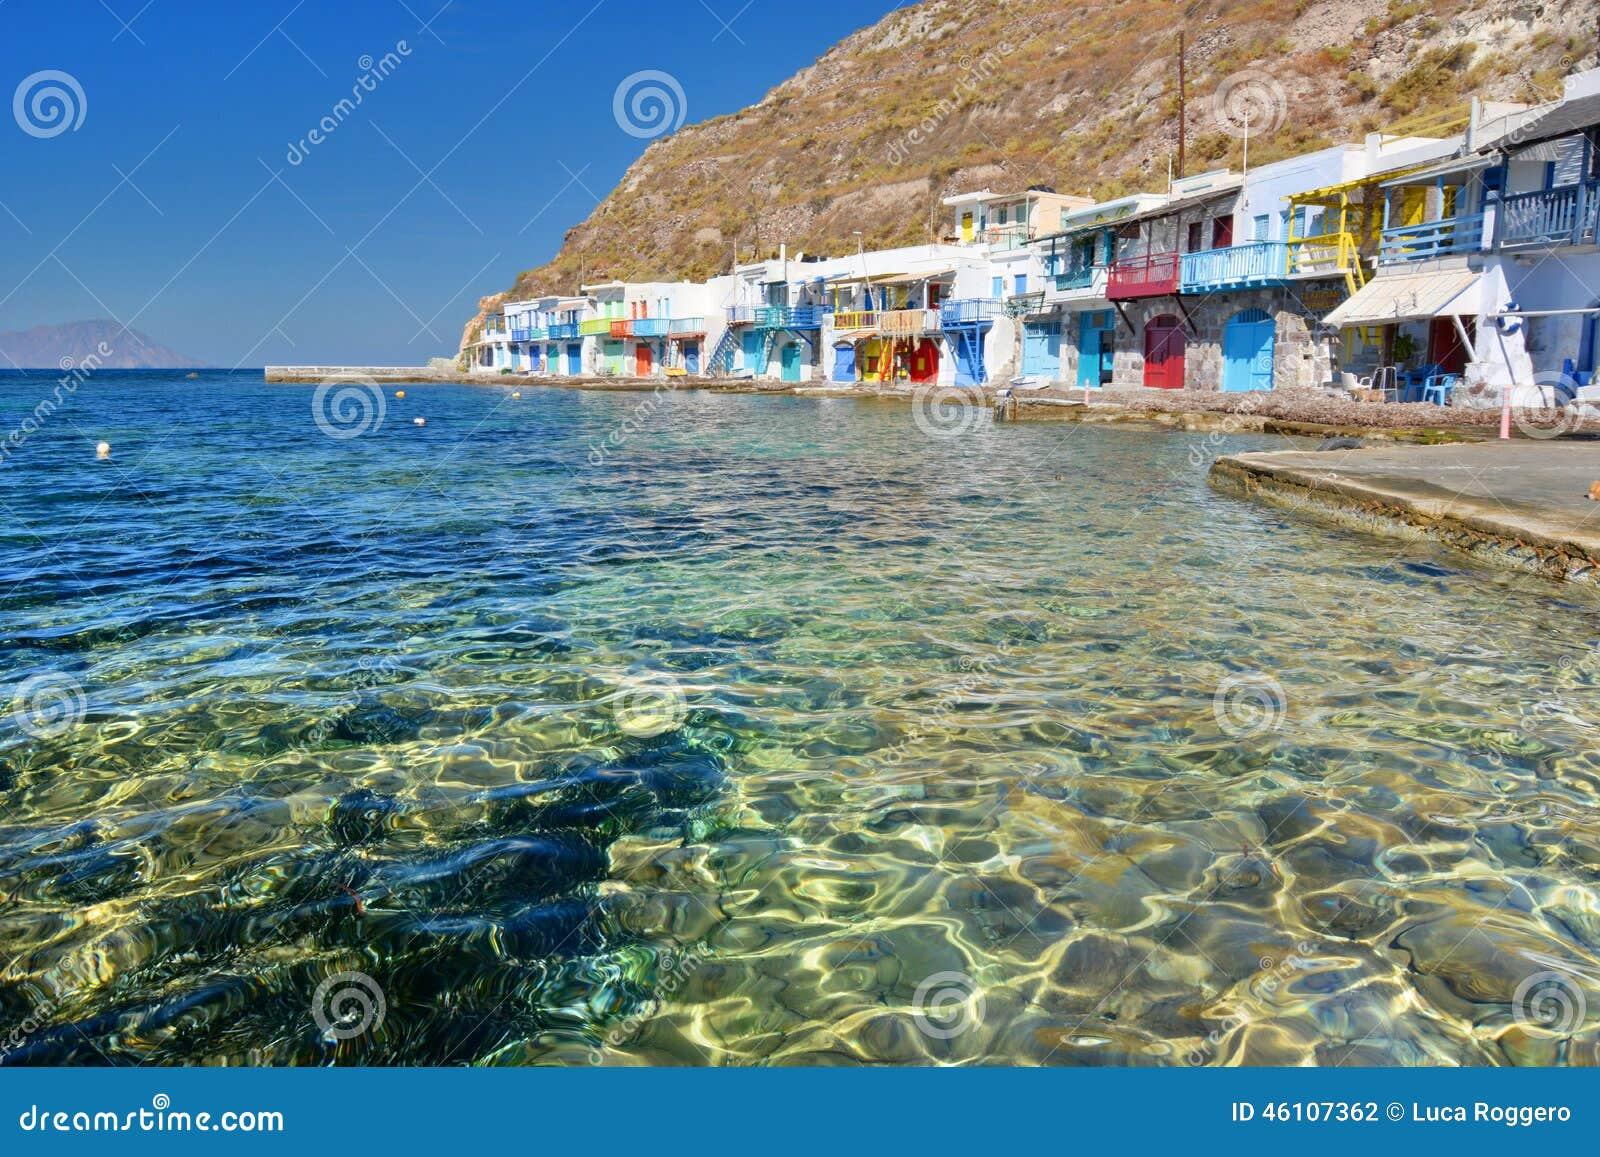 Traditioneel visserijdorp Klima, Milos De eilanden van Cycladen Griekenland